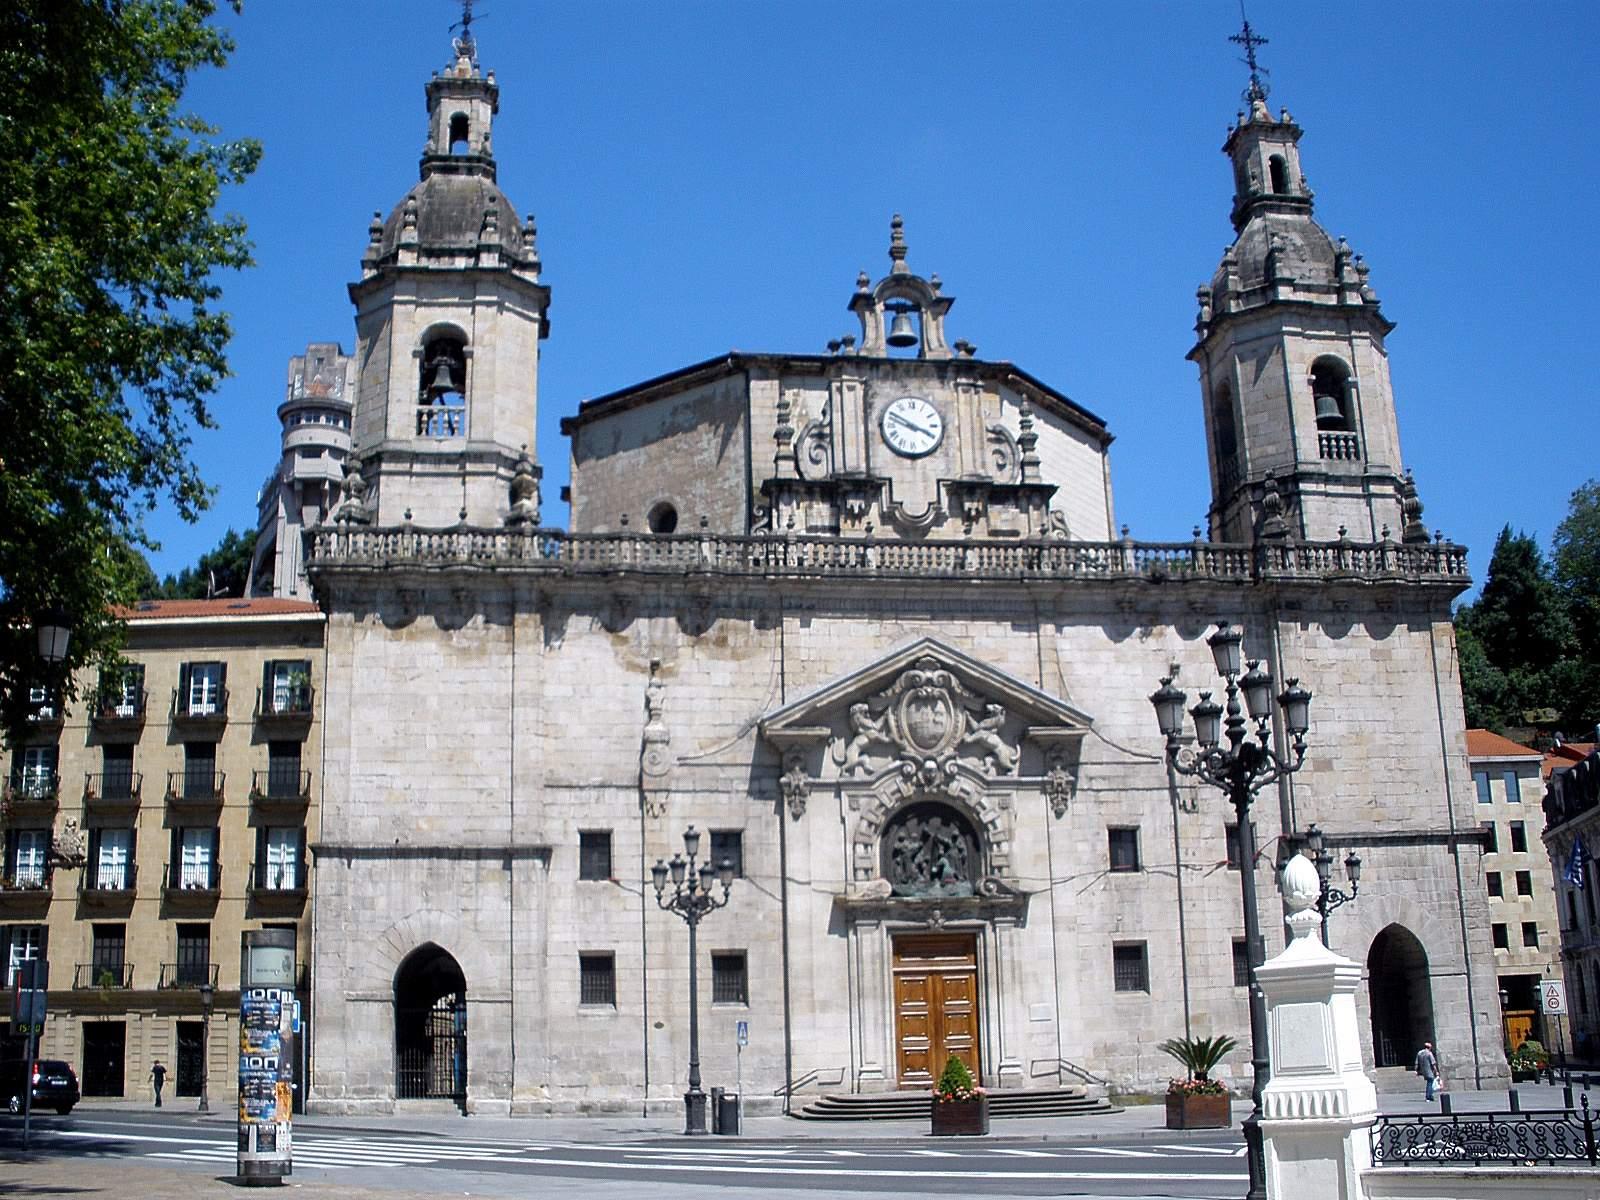 File:Bilbao - Iglesia de San Nicolás 17.jpg - Wikimedia Commons